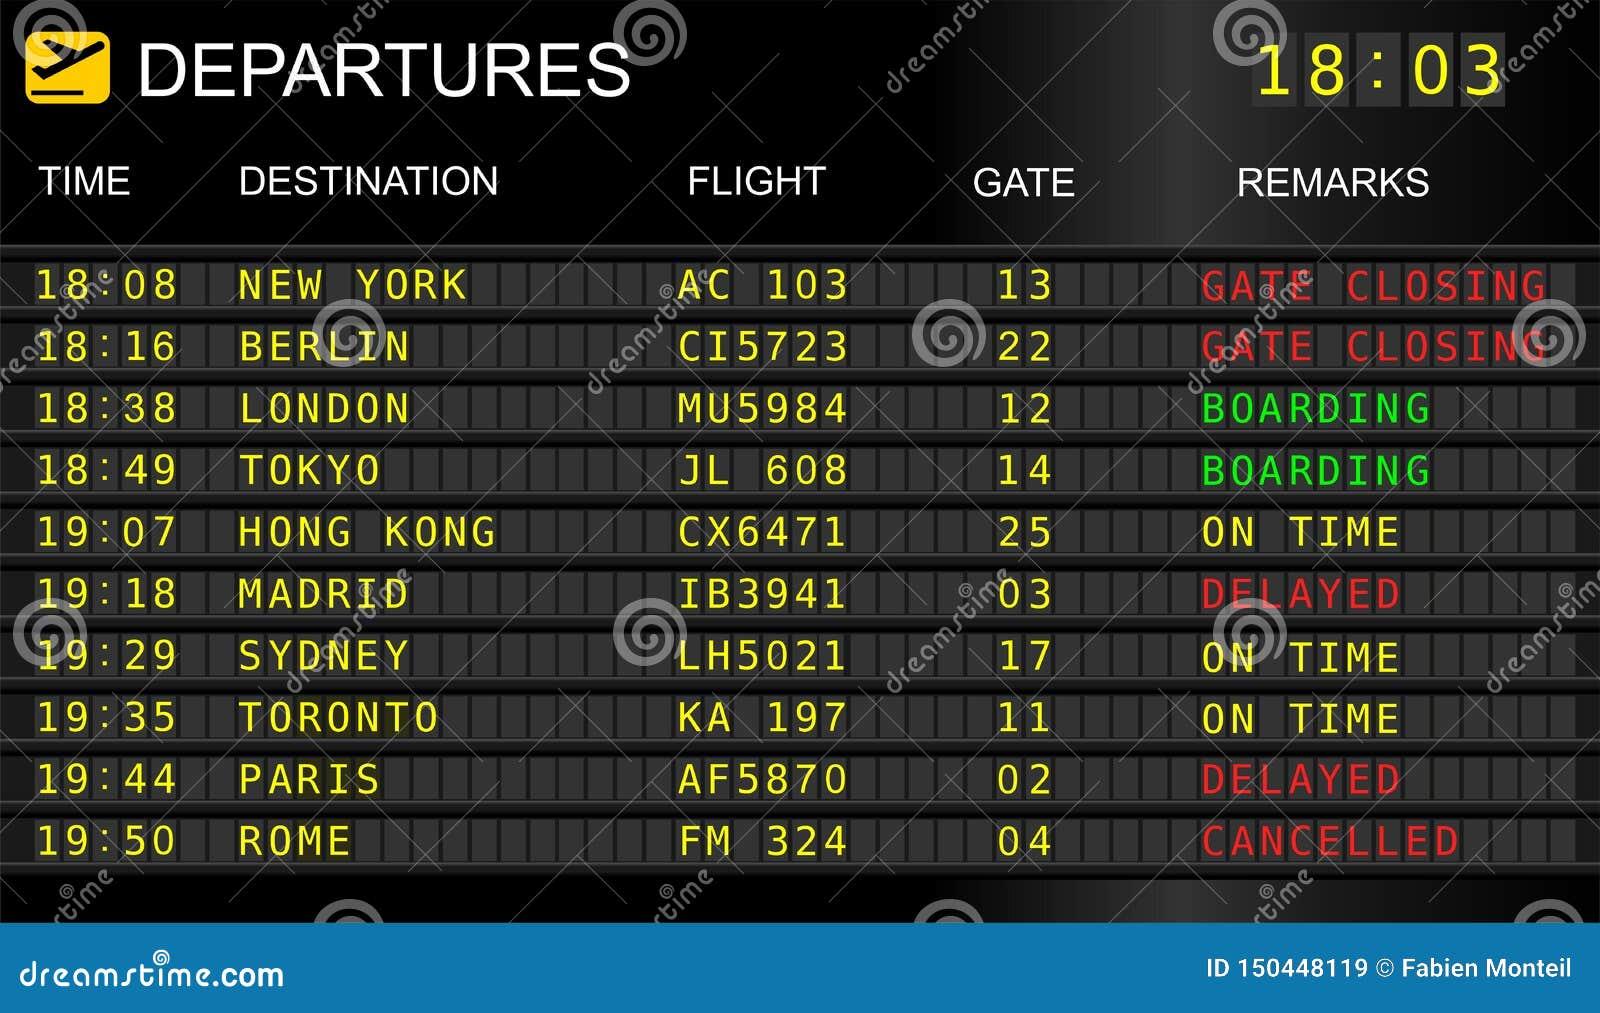 flights-departures-board-flight-informat